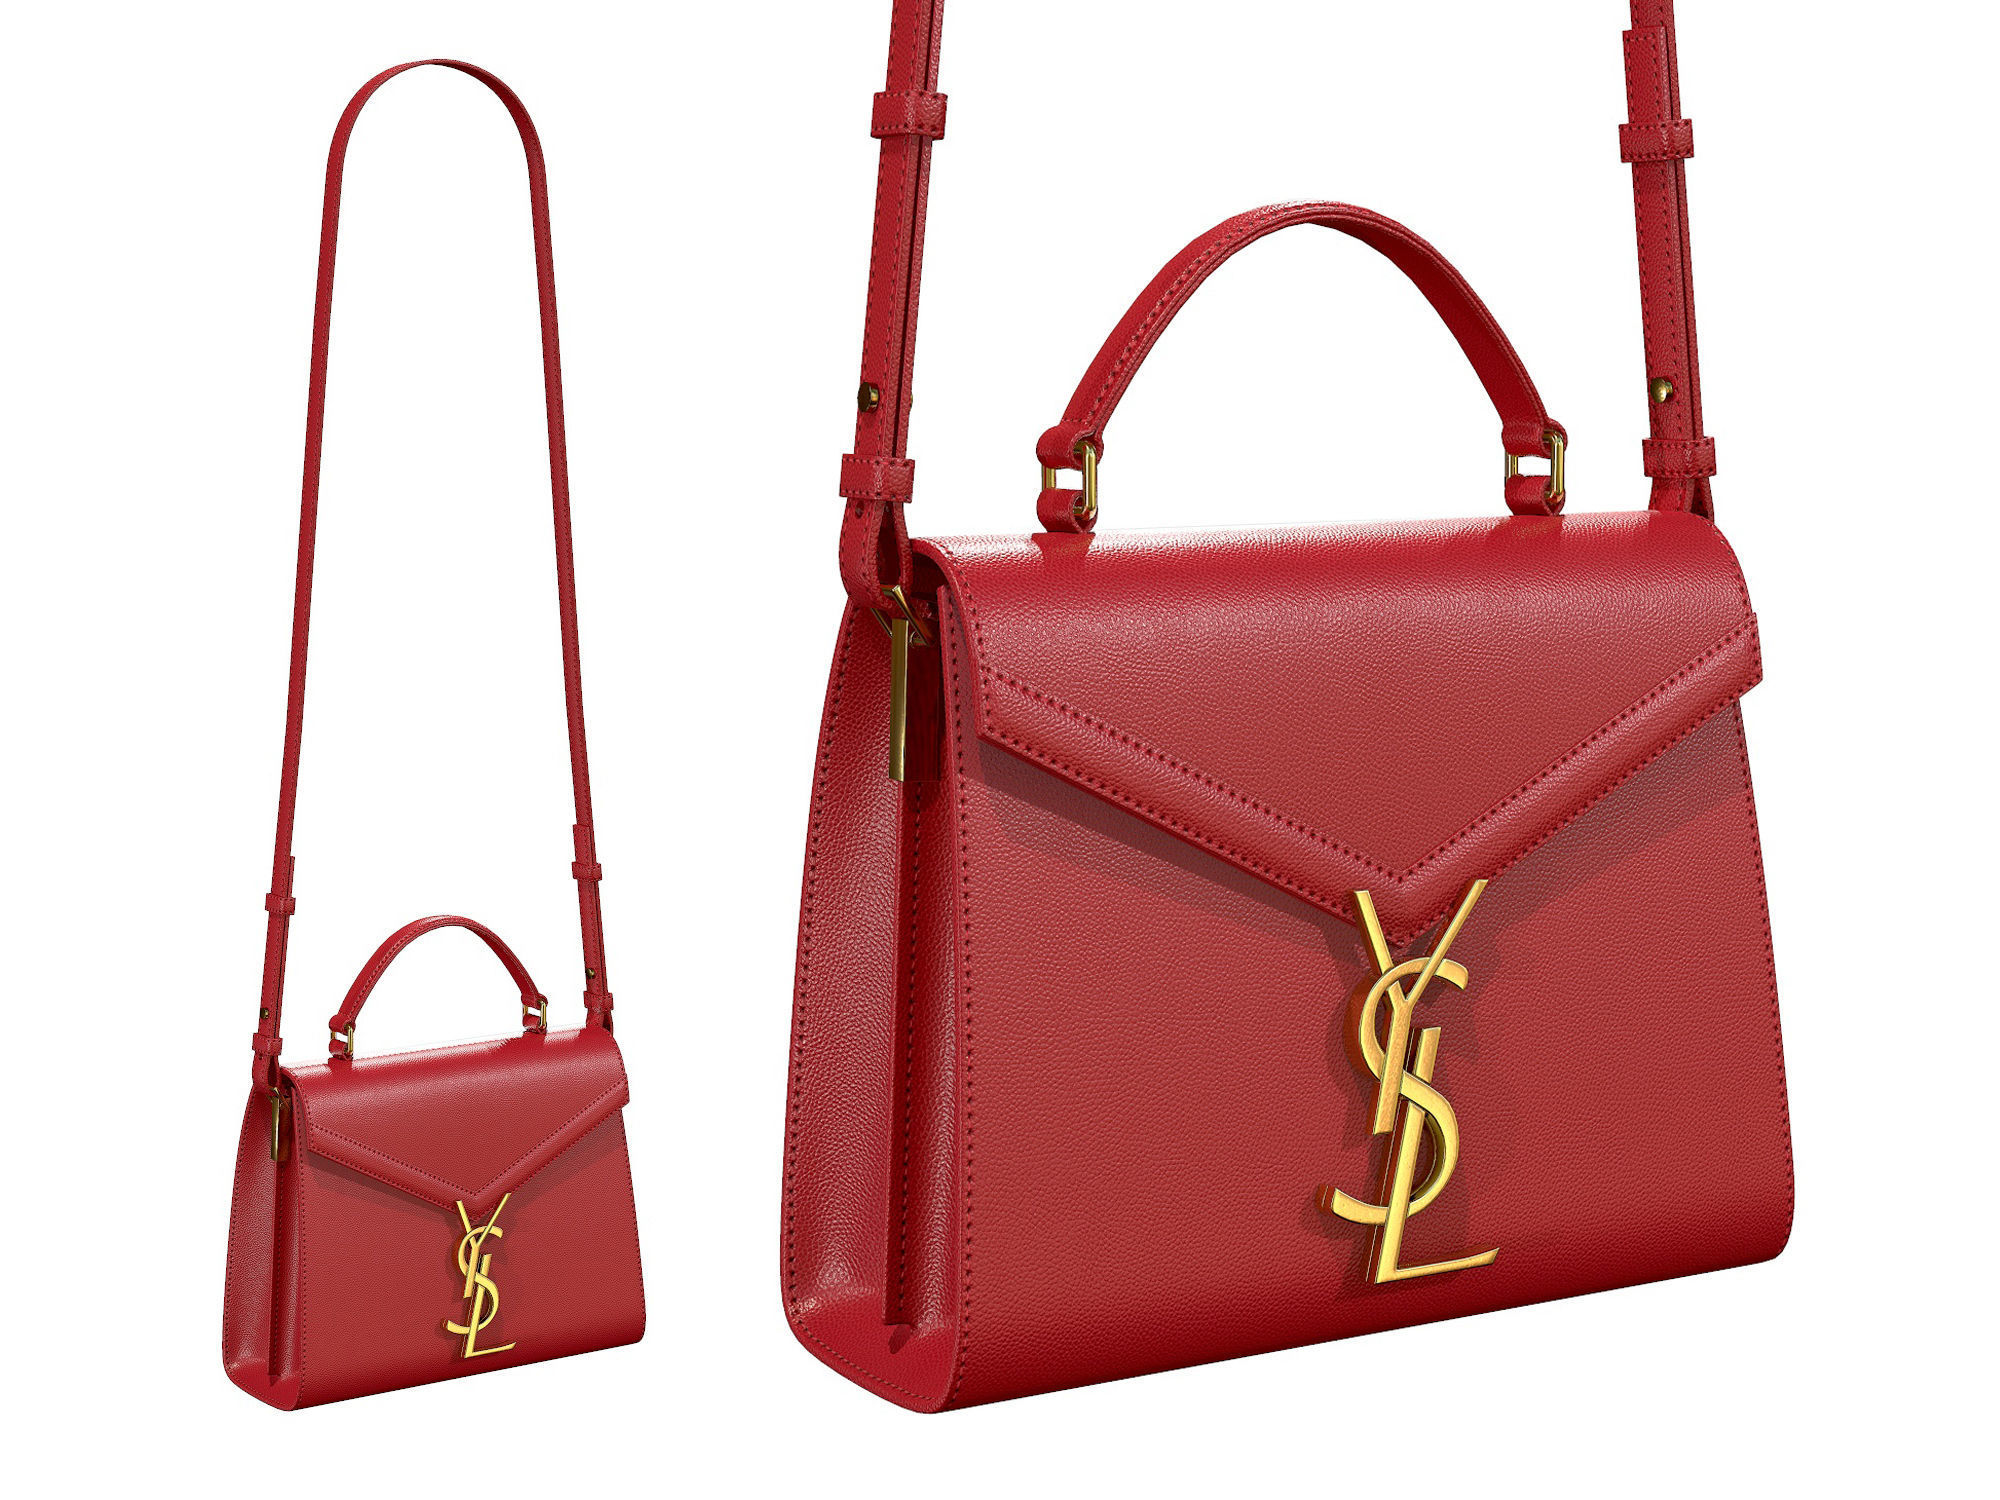 YSL Saint Laurent Cassandra Mini Top Bag Red Leather